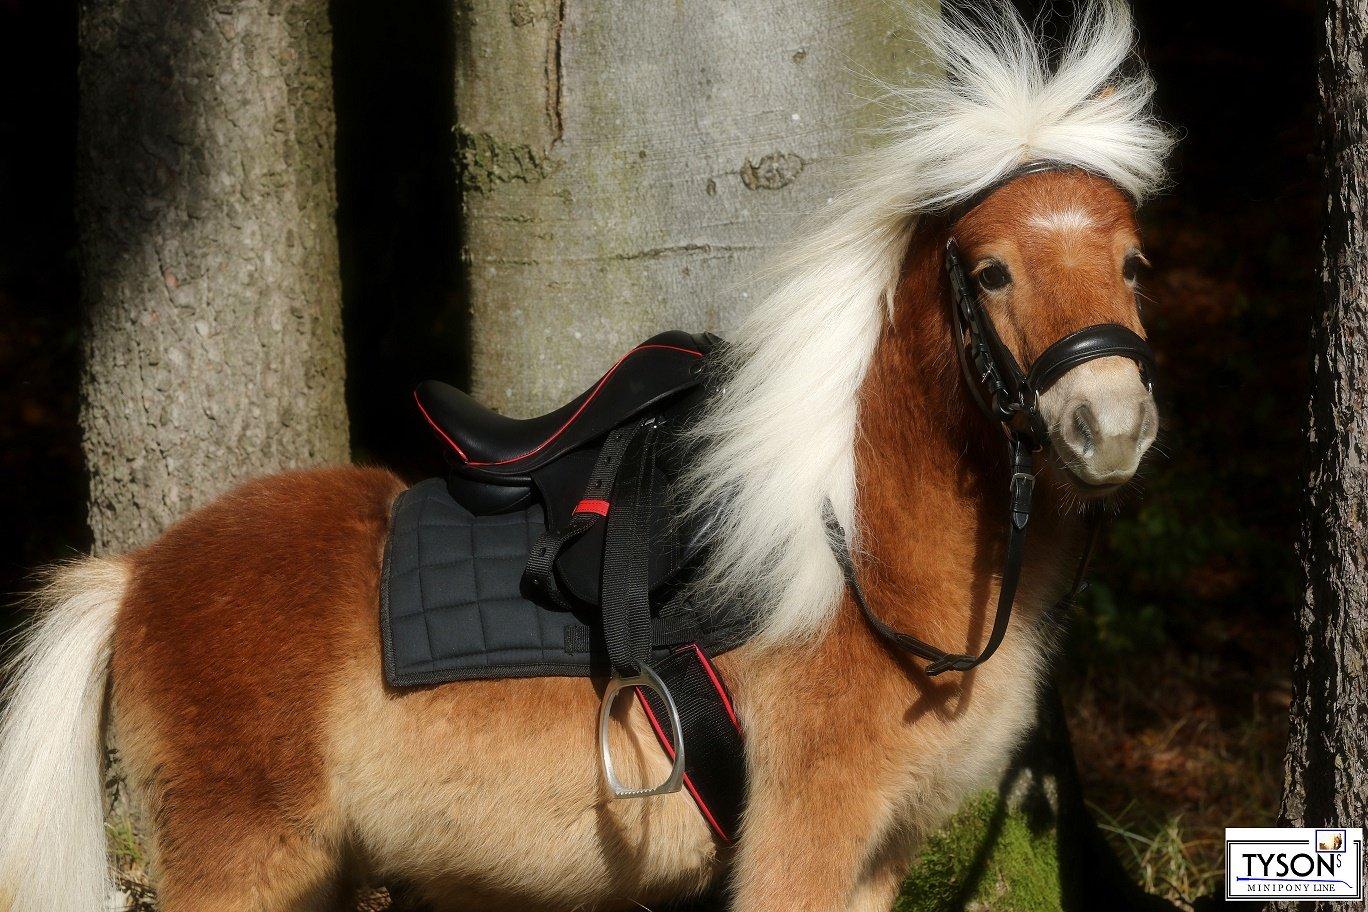 Ledersattel Glitzer Mini Shetty Minishetty Mini Pony Falabella Dressur 8 10 oder 12 Zoll Tysons Breehes